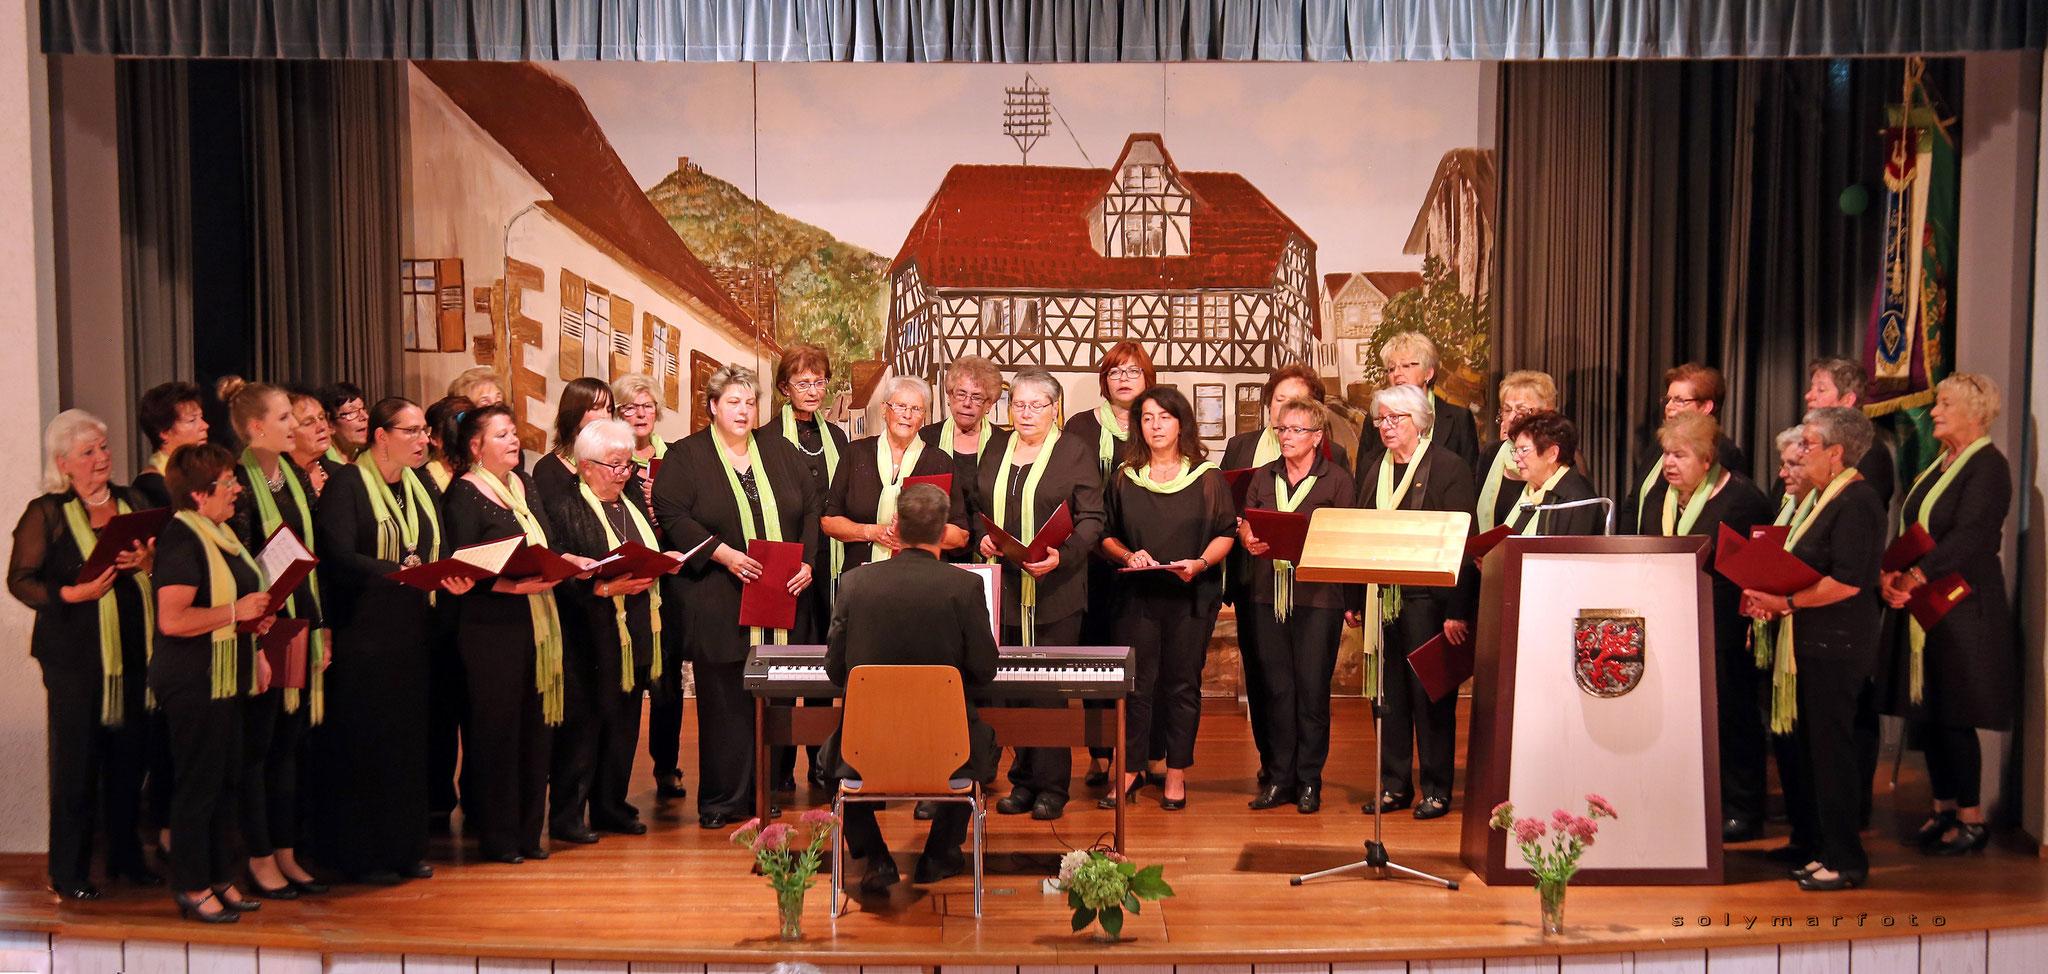 Liederabend Ramberg 2017